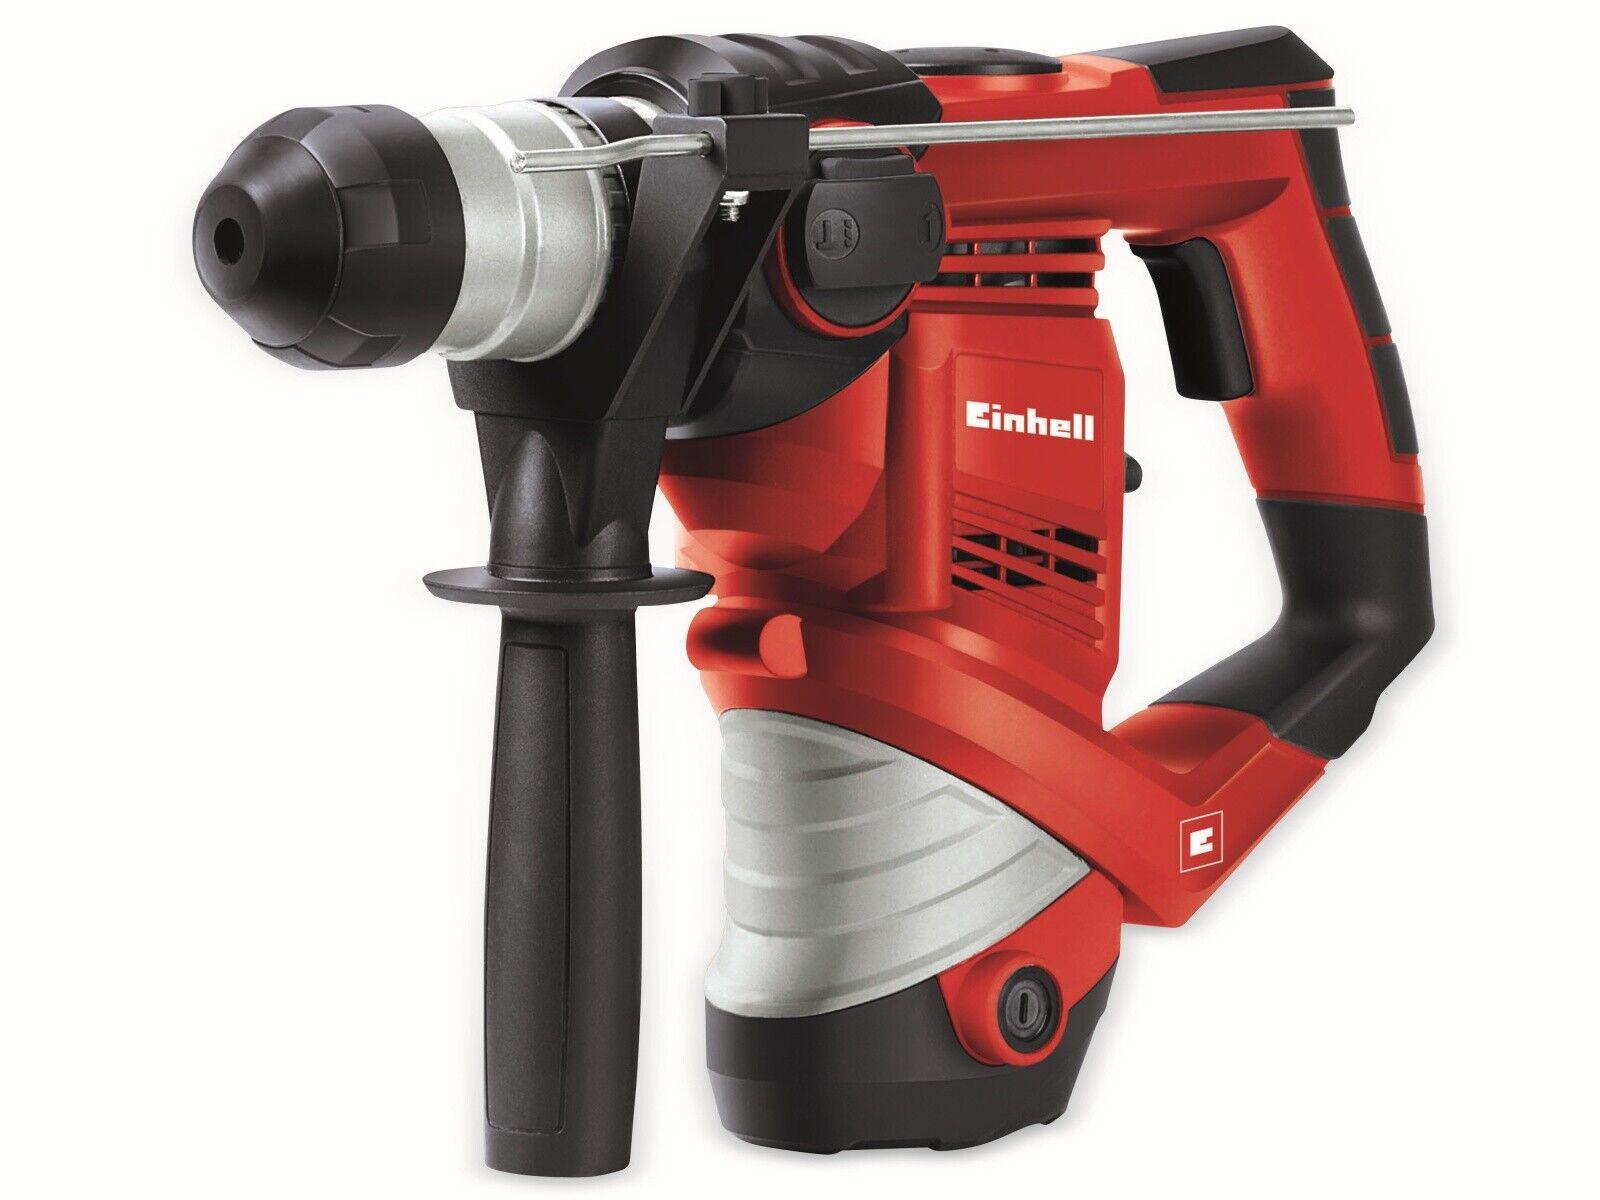 Bohrhammer EINHELL TH-RH 900 1, SDS-Plus, 230V, 900 W